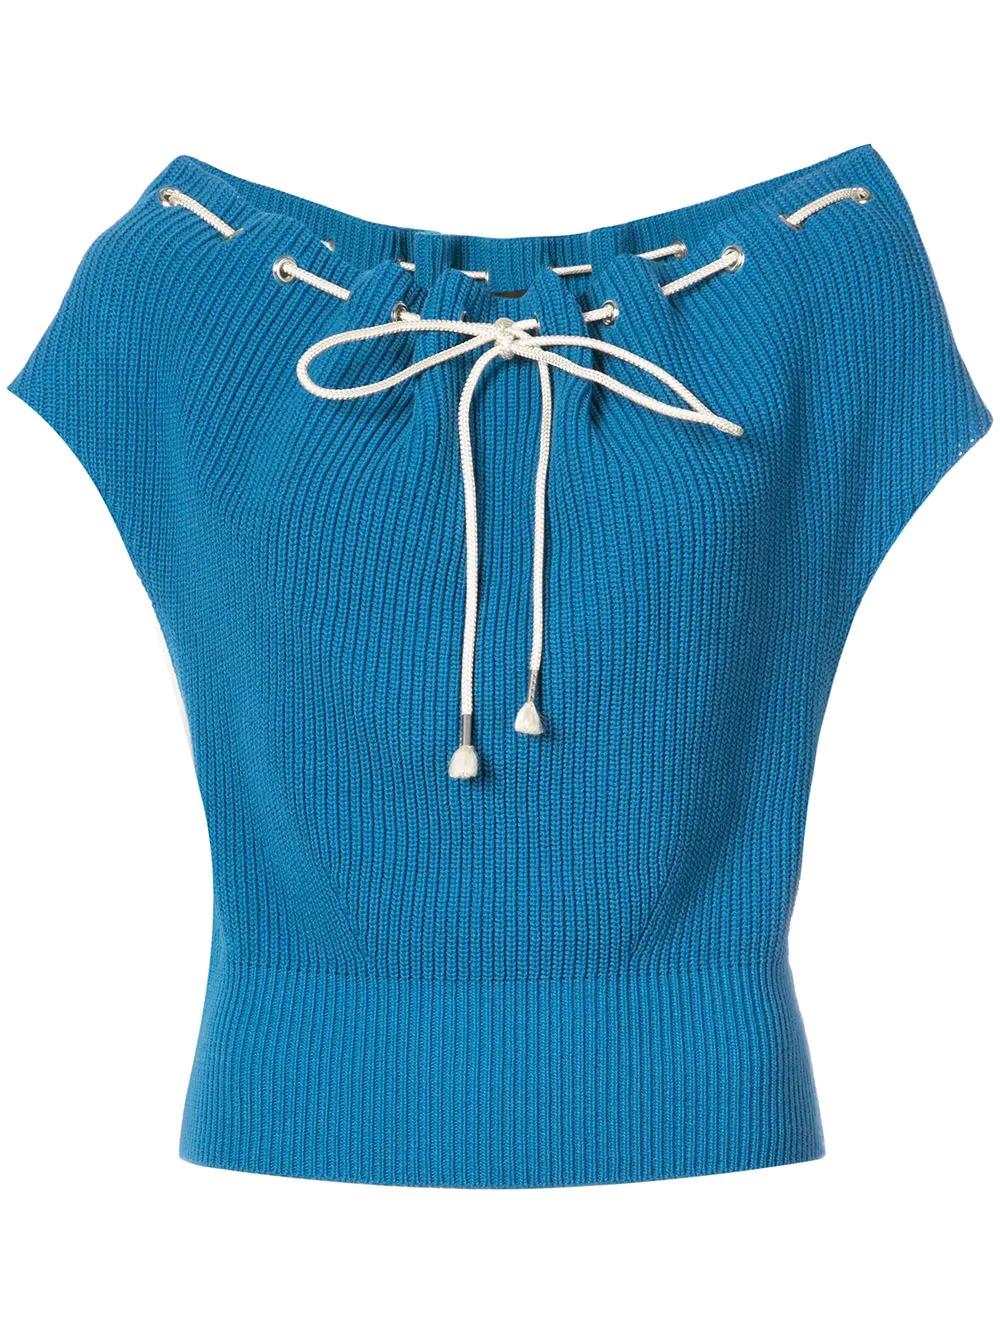 Calvin Klein   свитер свободного кроя со шнуровкой   Clouty